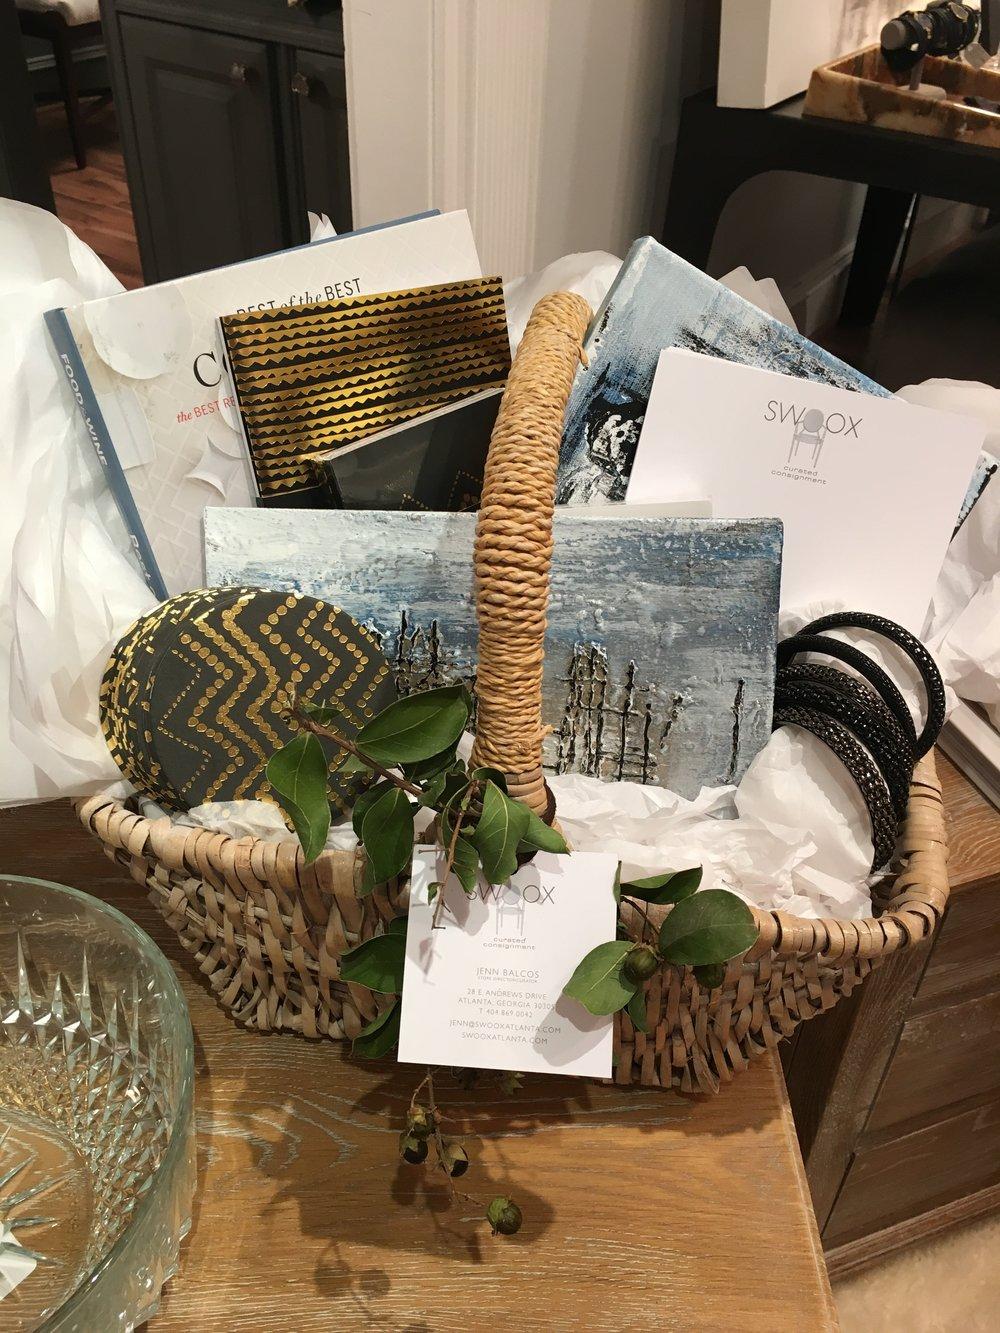 Swoox Gift Basket